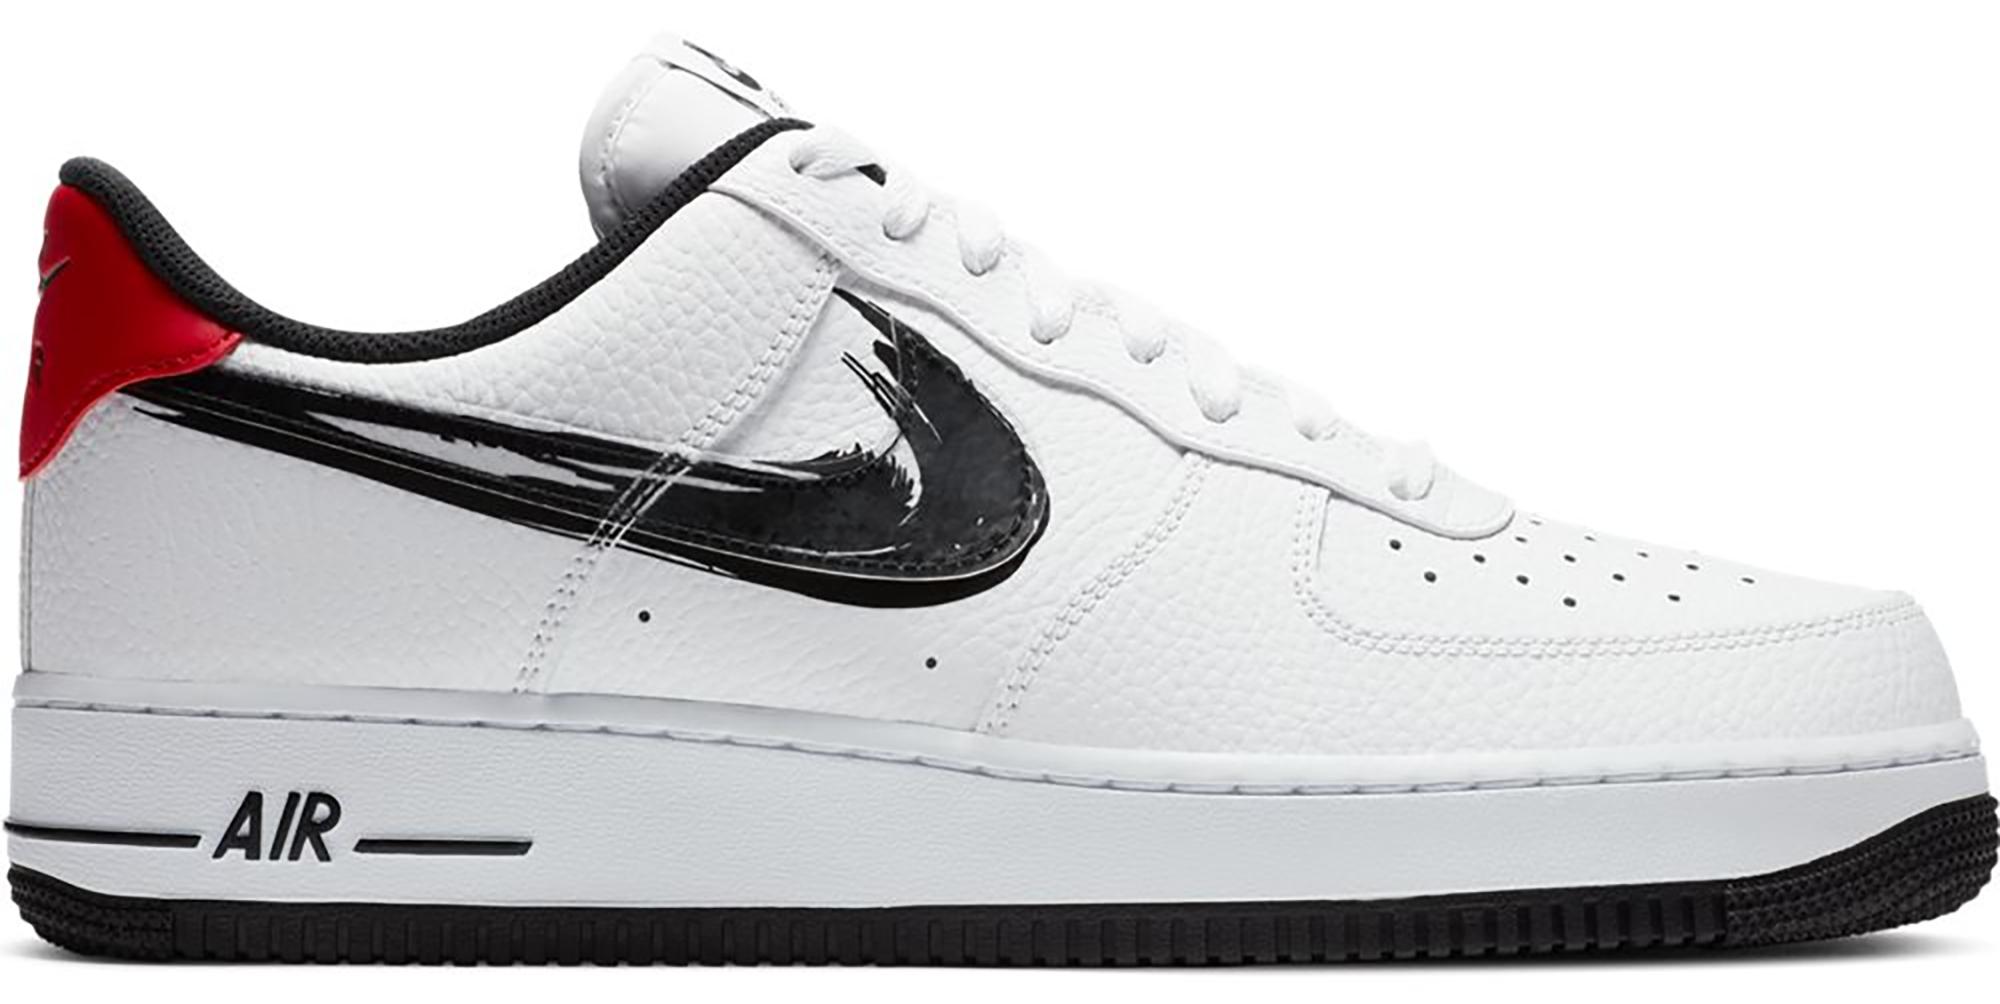 Nike Air Force 1 Low Brushstroke White